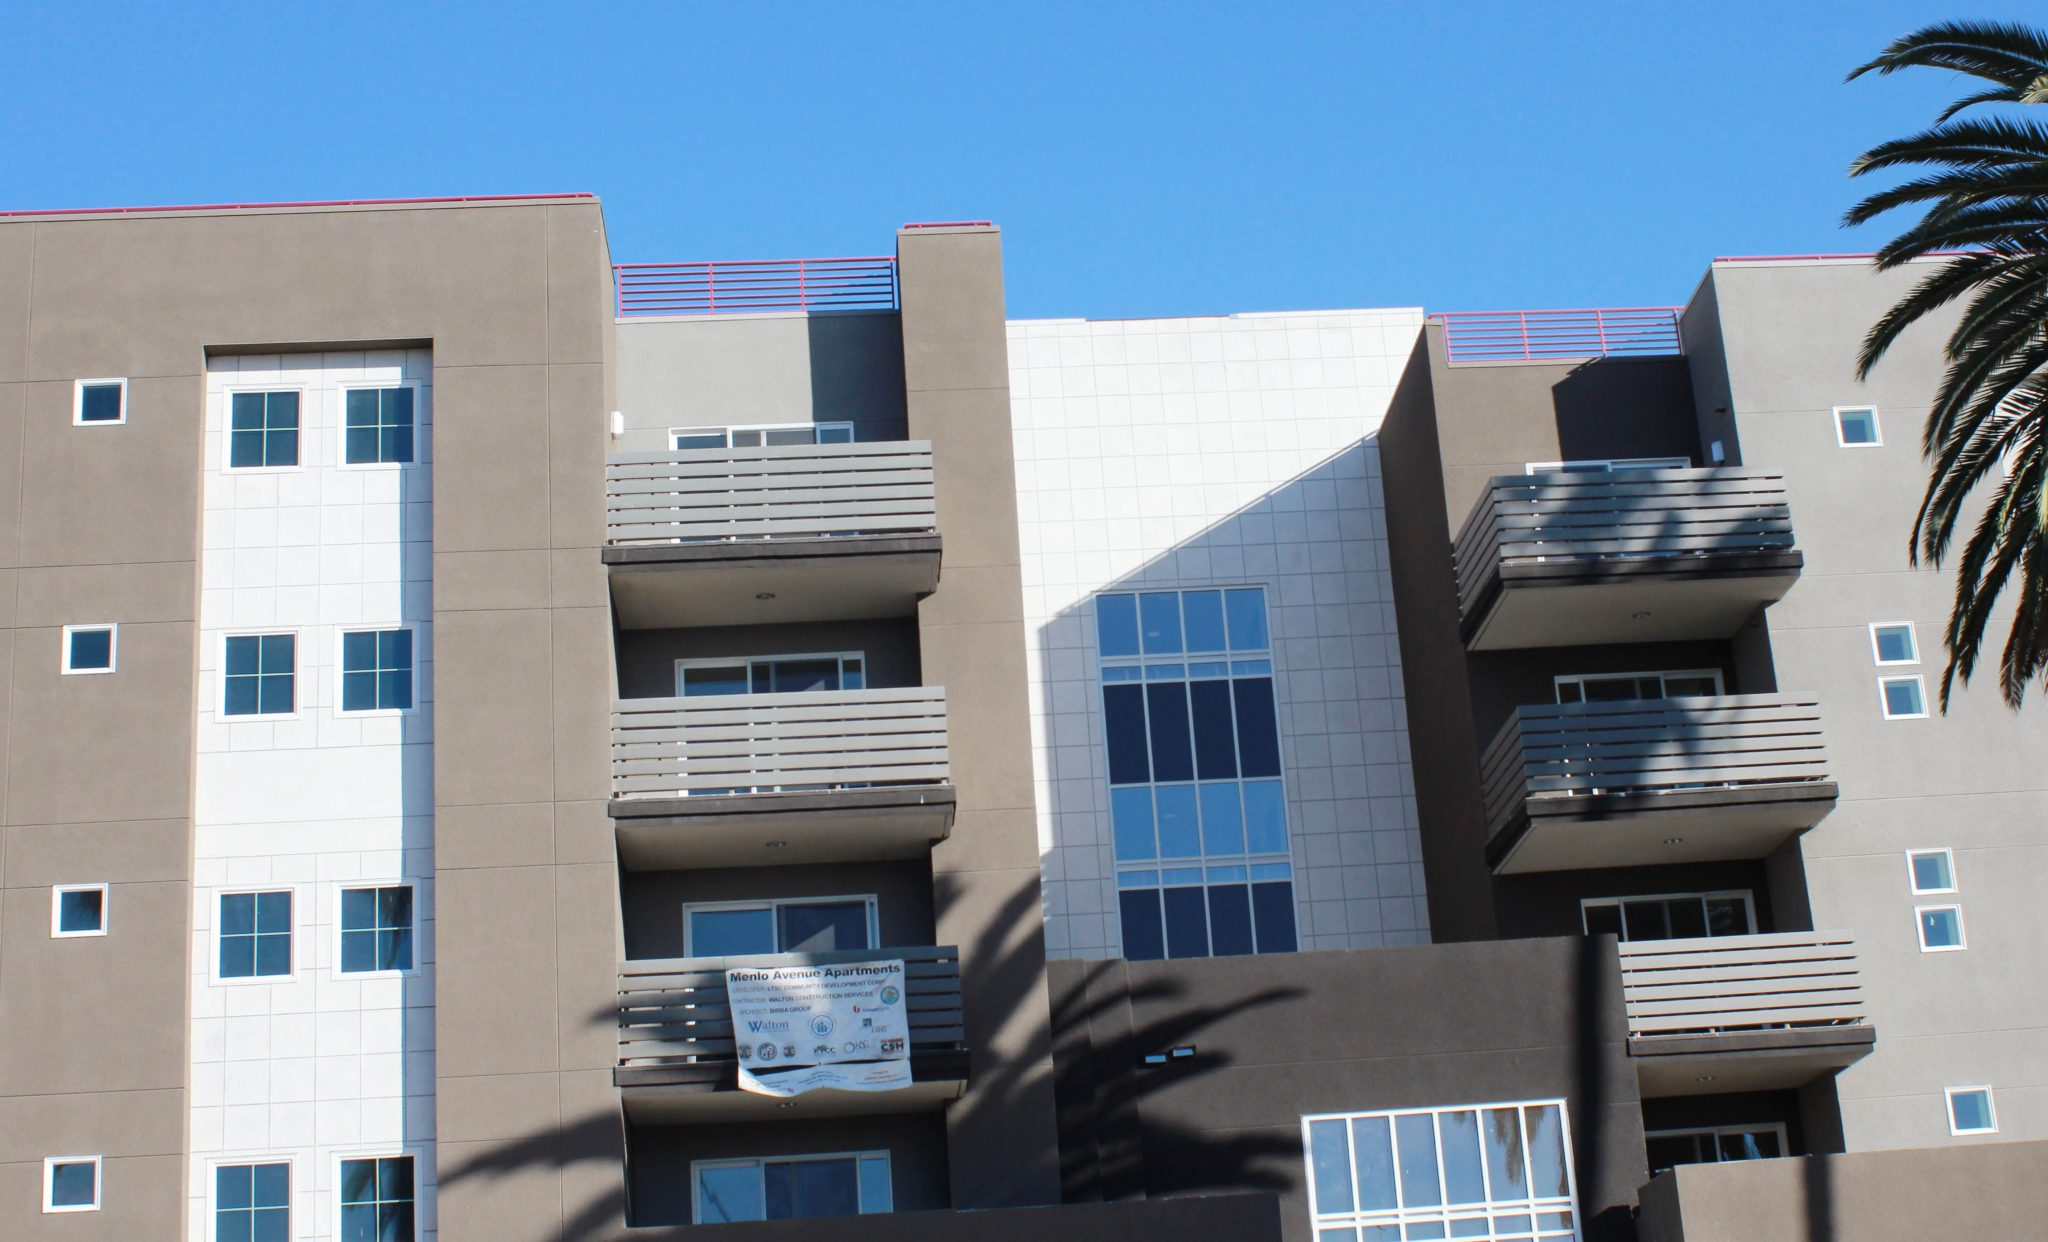 Menlo Family Apartments